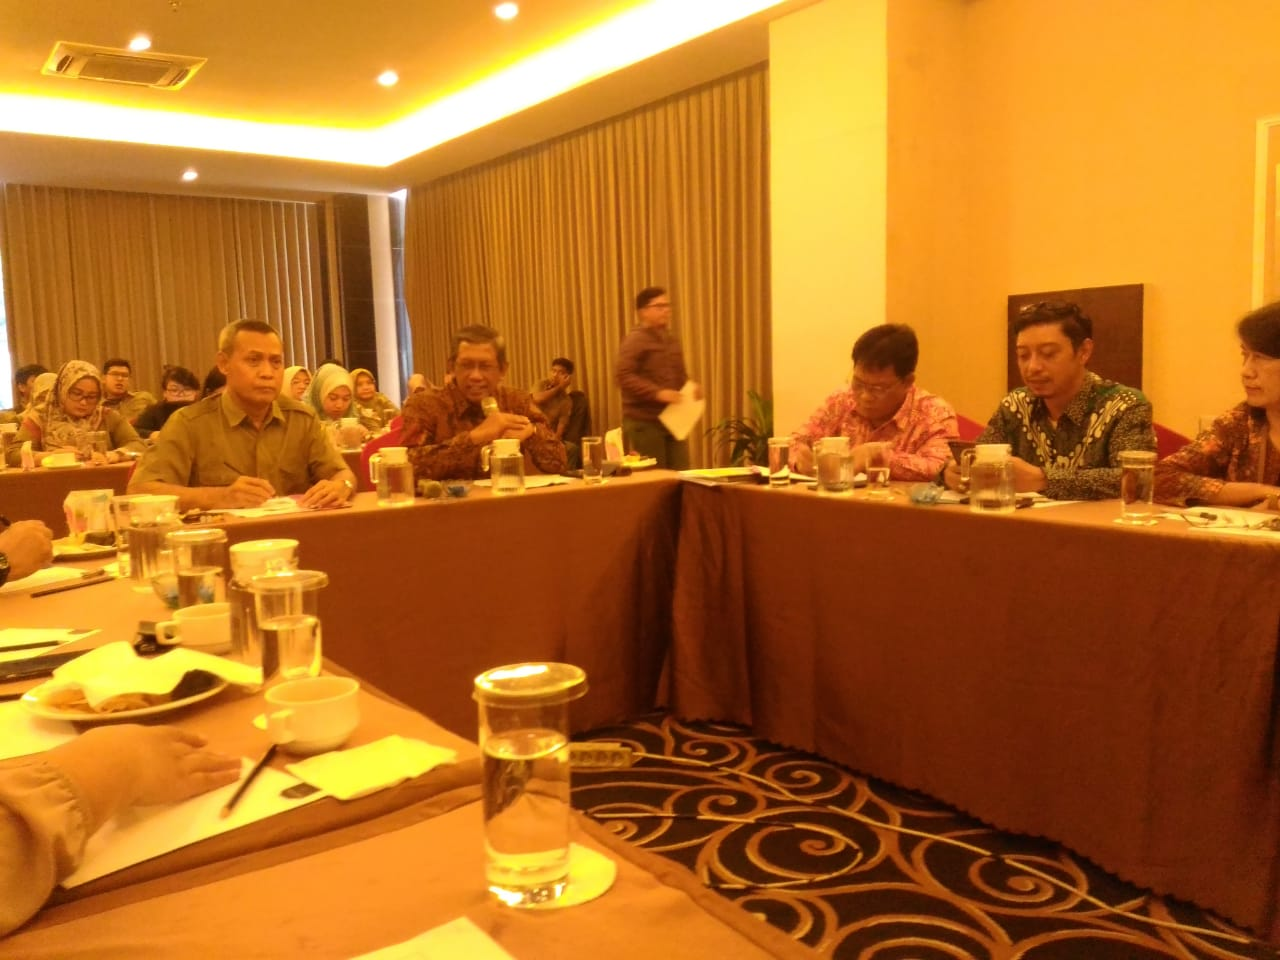 Kanwil DJKN Lamkulu Siap Mengelola Penyerahan Piutang Negara dari BLU Pusat Pembiayaan Pembangunan Hutan